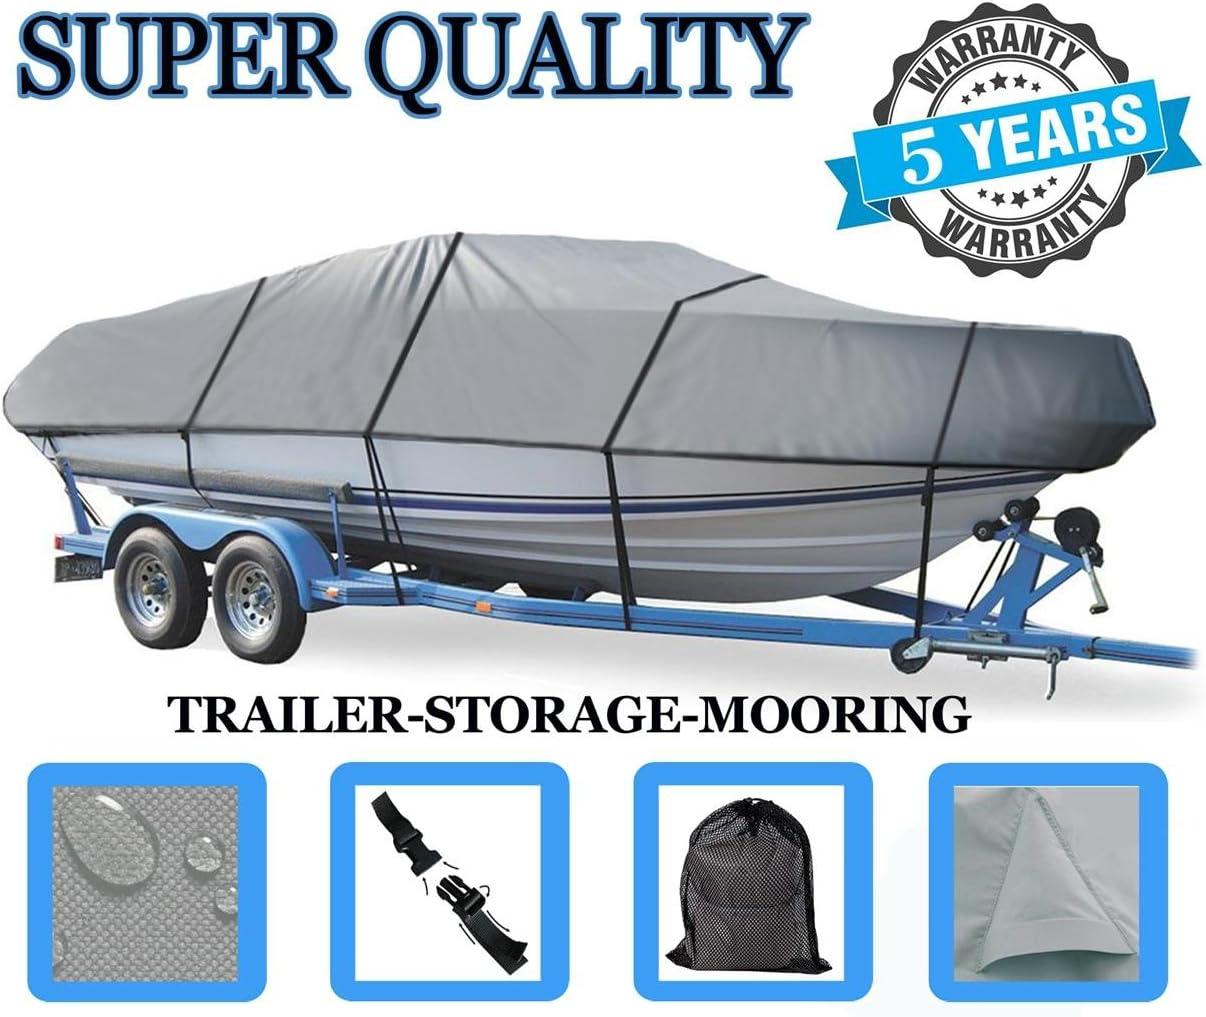 SBU Boat Cover for Northwood 1457/1467 Fisherman All Years Heavy-Duty 712rVEsp5yLSL1217_